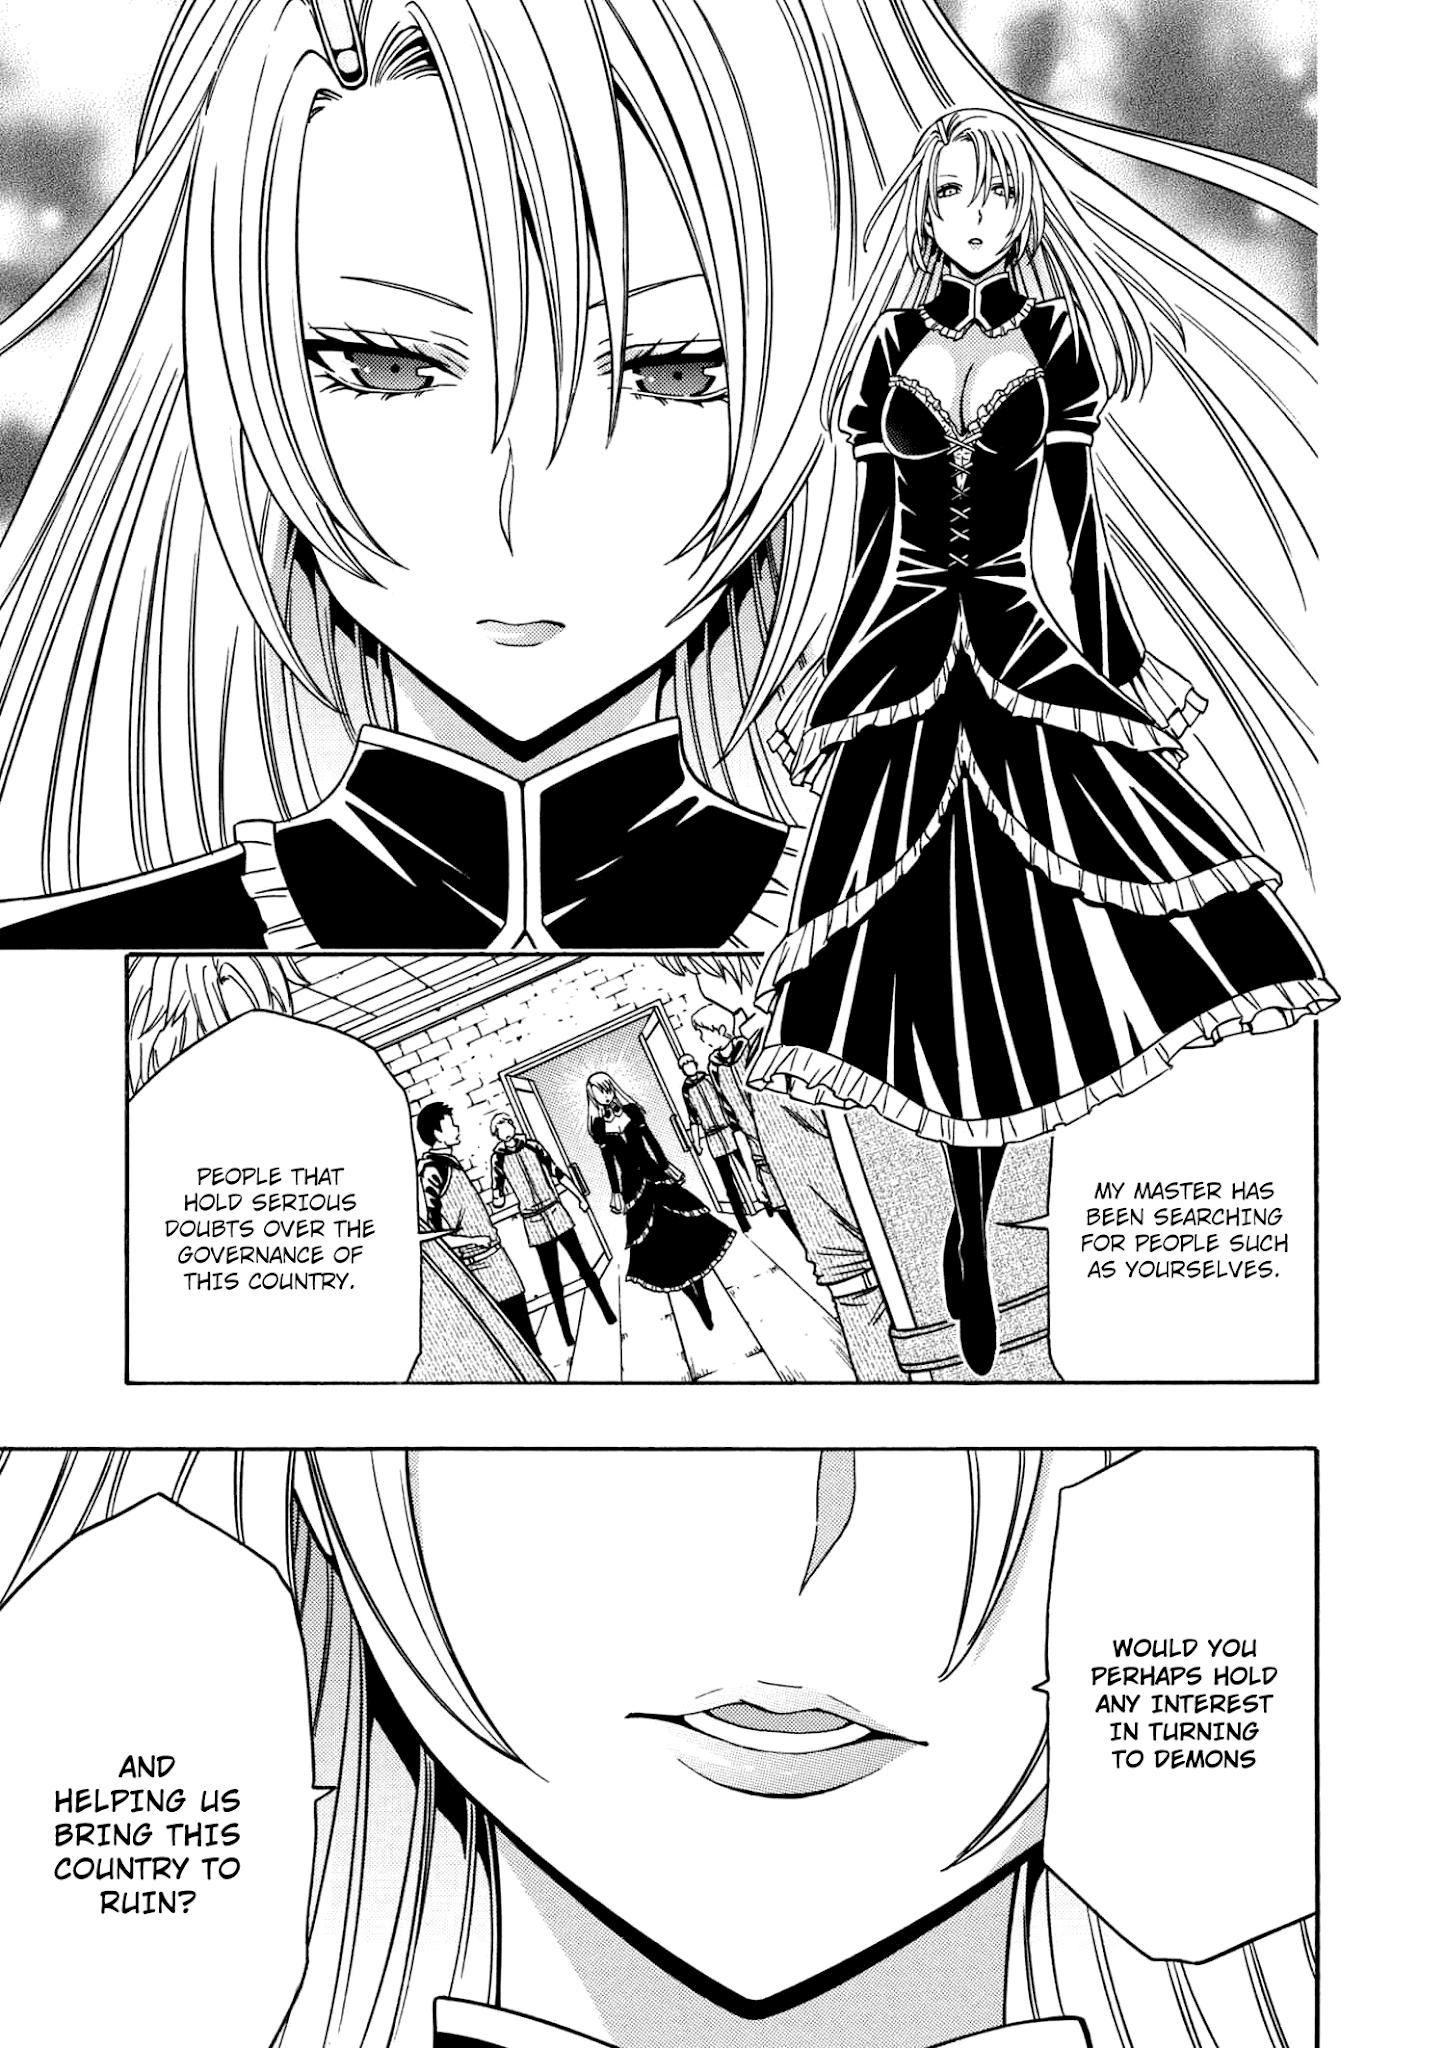 Baca manga kenja no mago